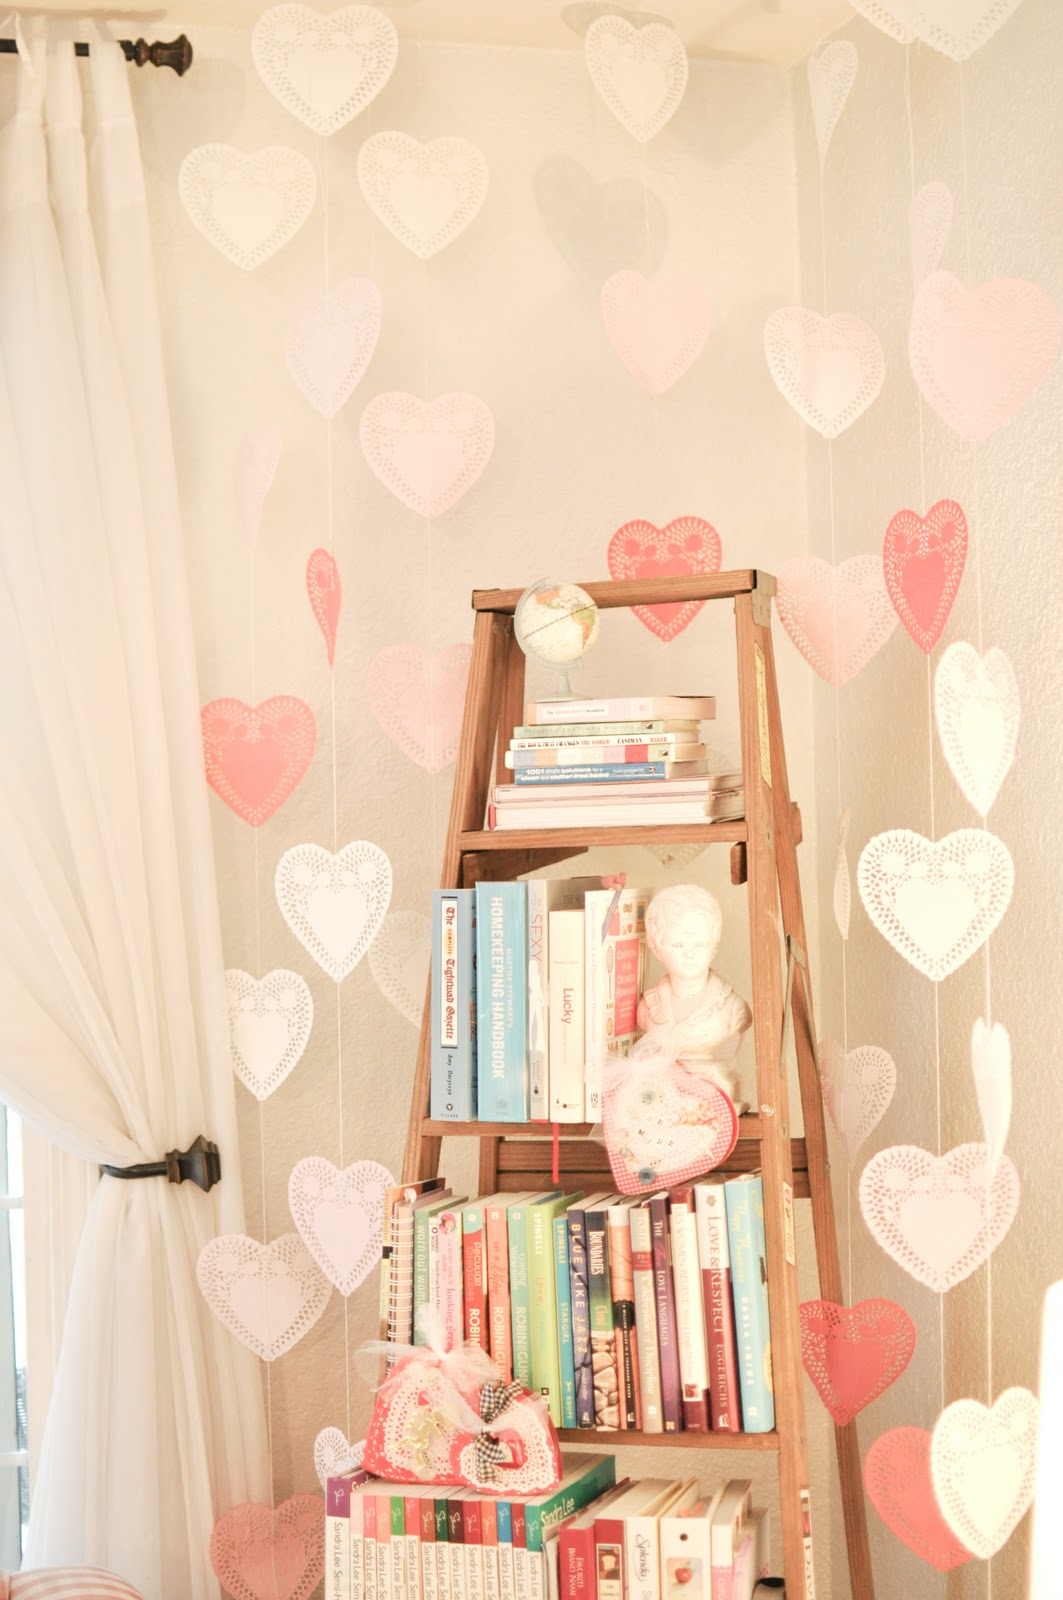 diy-valentines-ladder-bookshelves